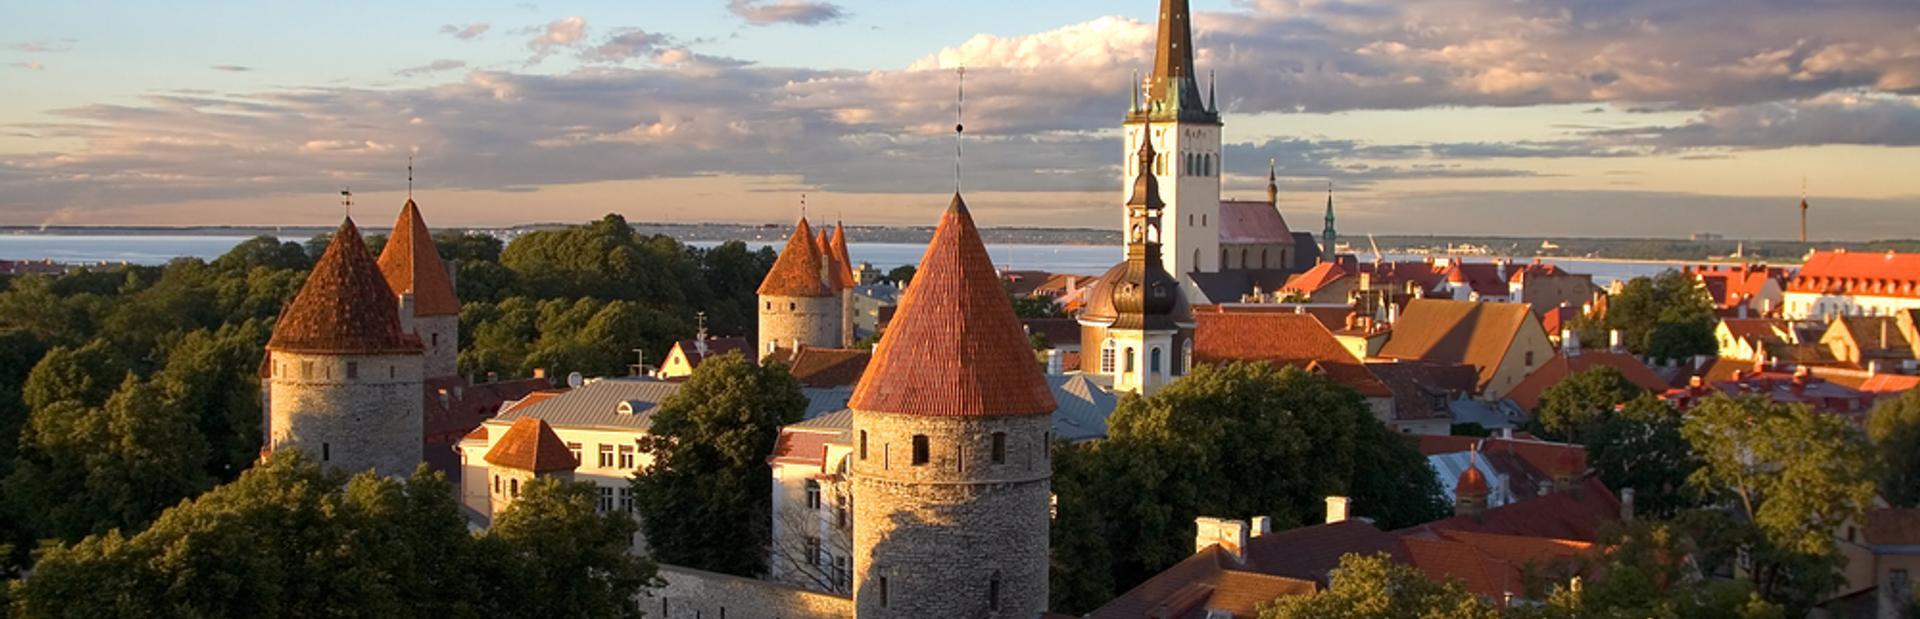 Baltic Sea Region photo tour